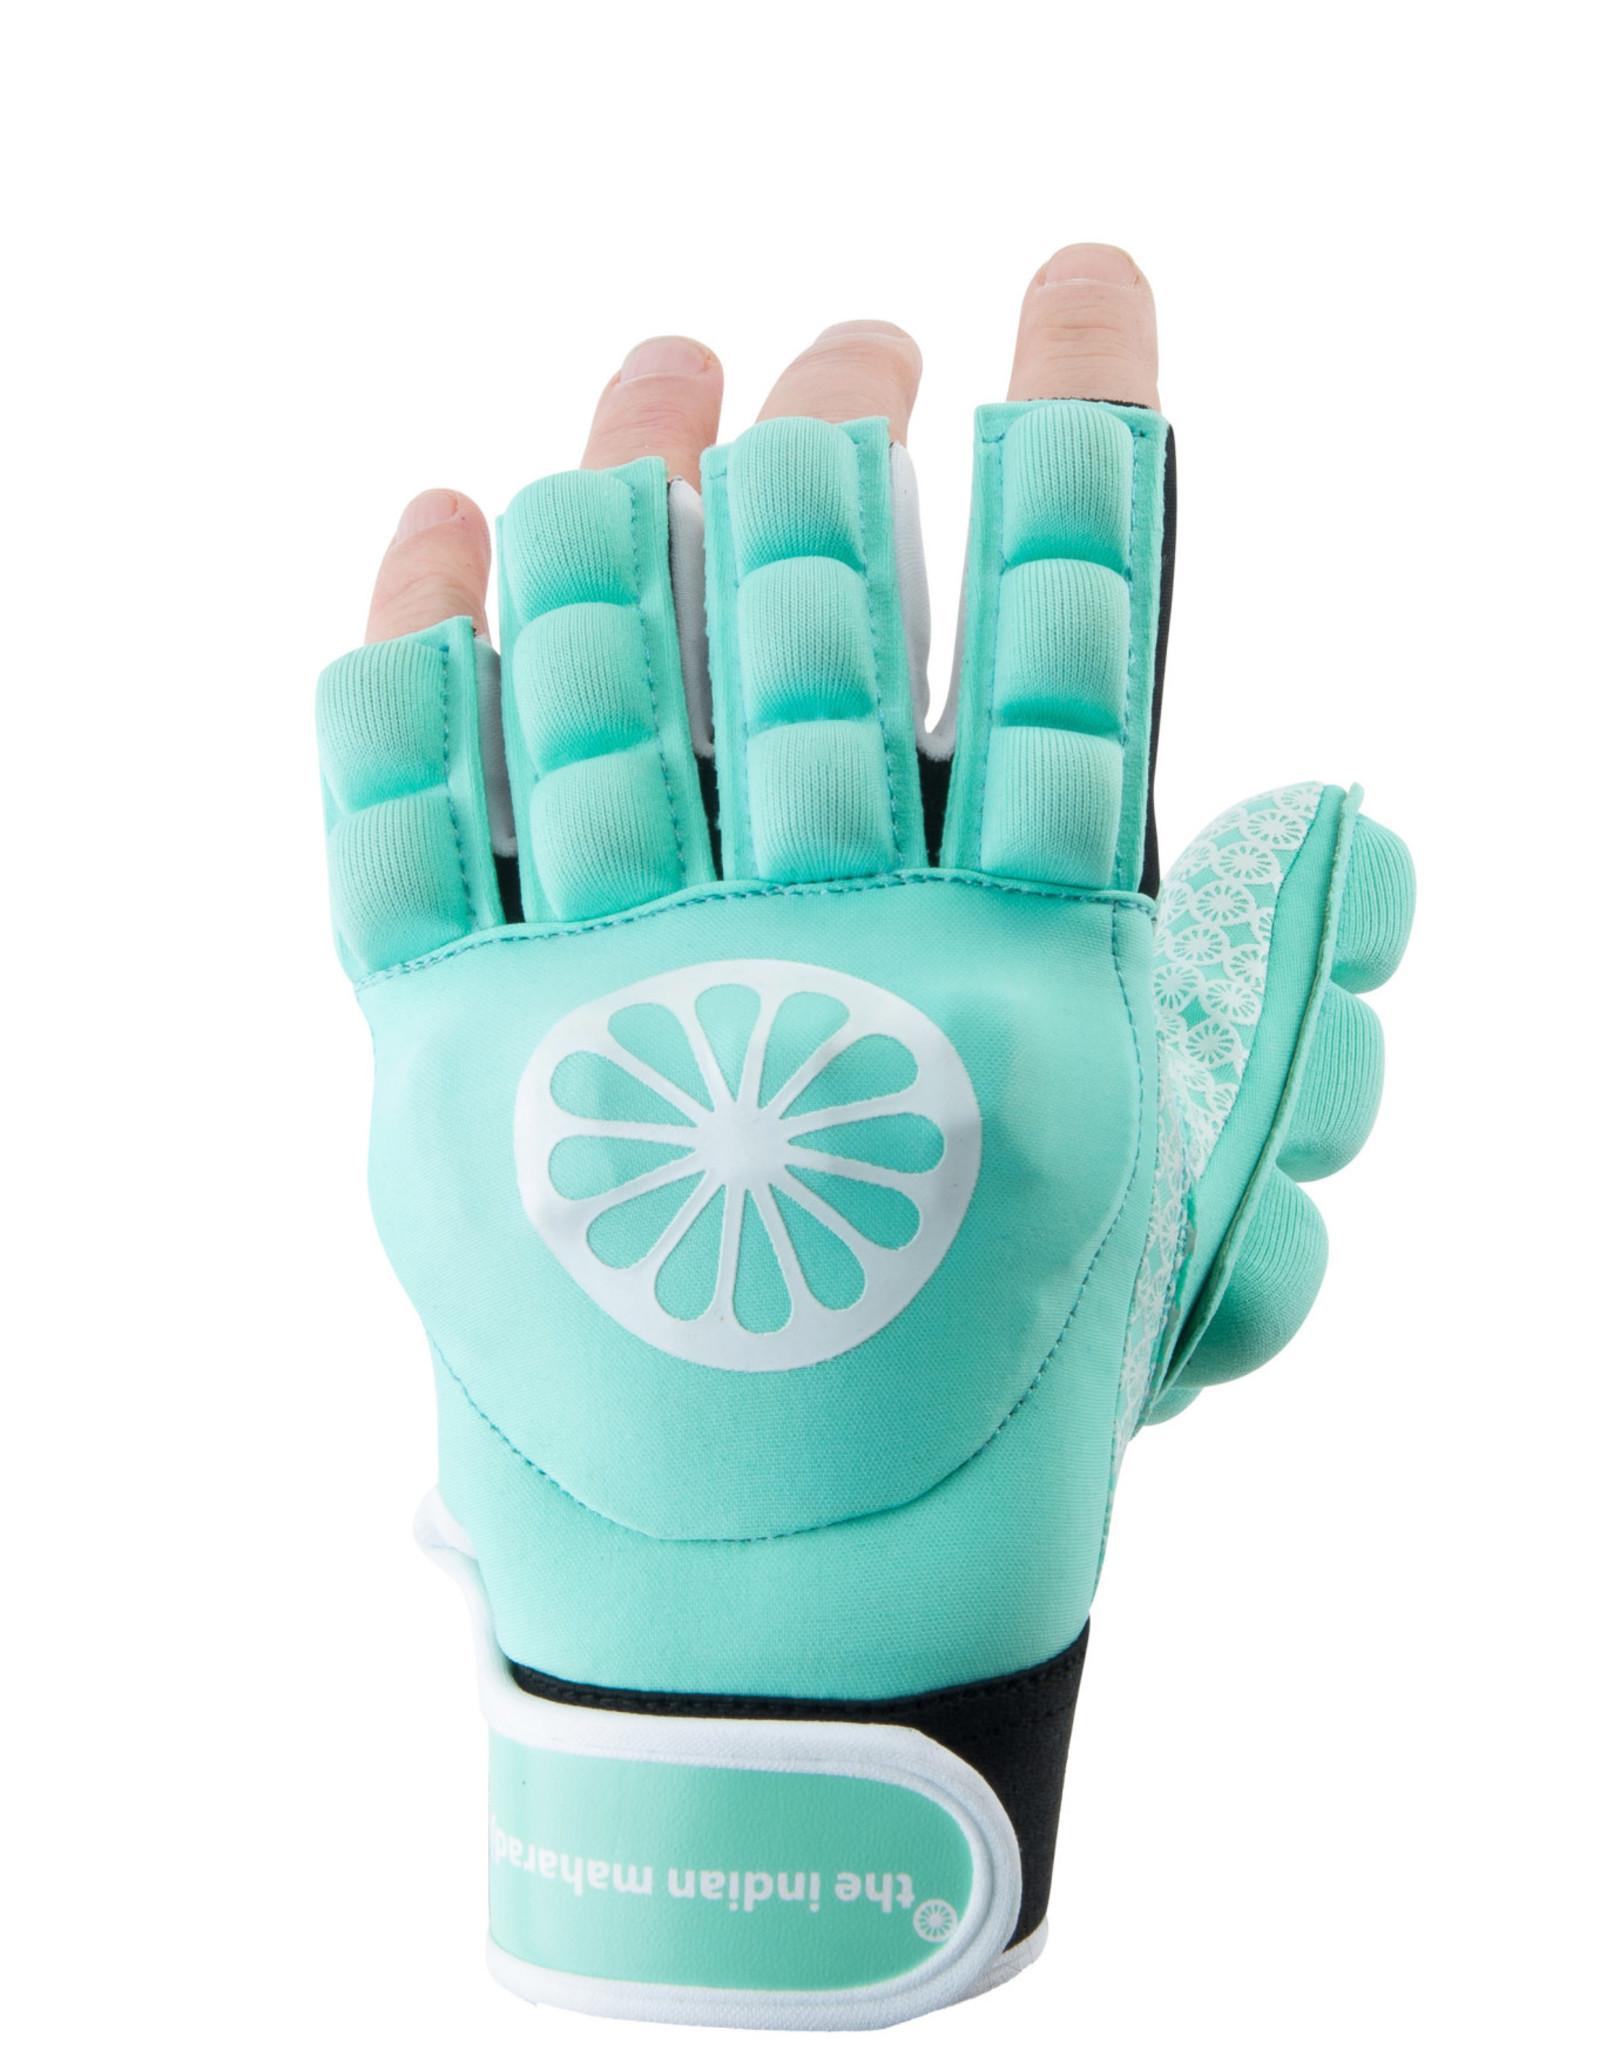 Maharadja Glove shell/foam half [left]-mint-S